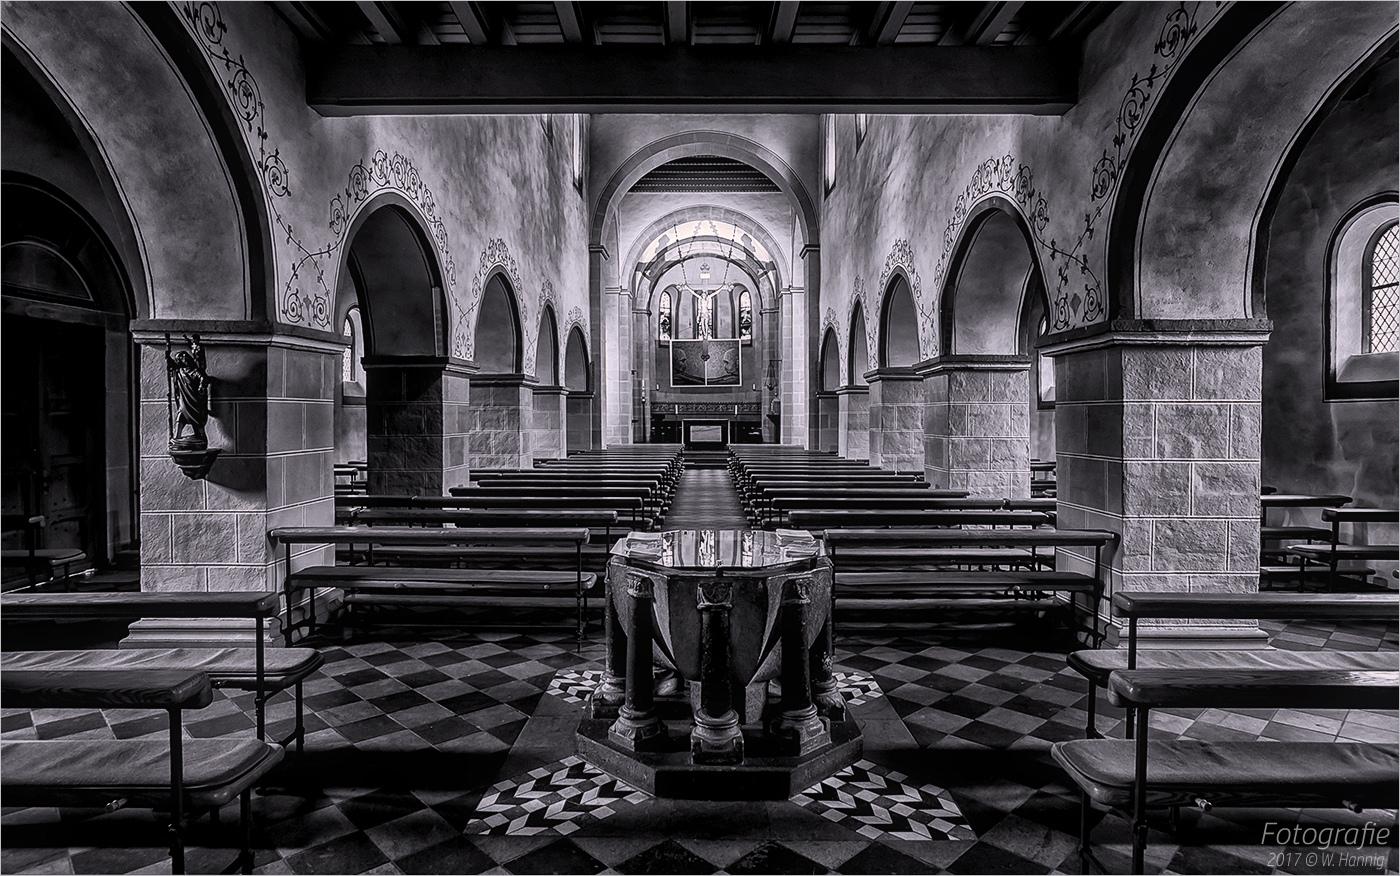 St. Pankratius